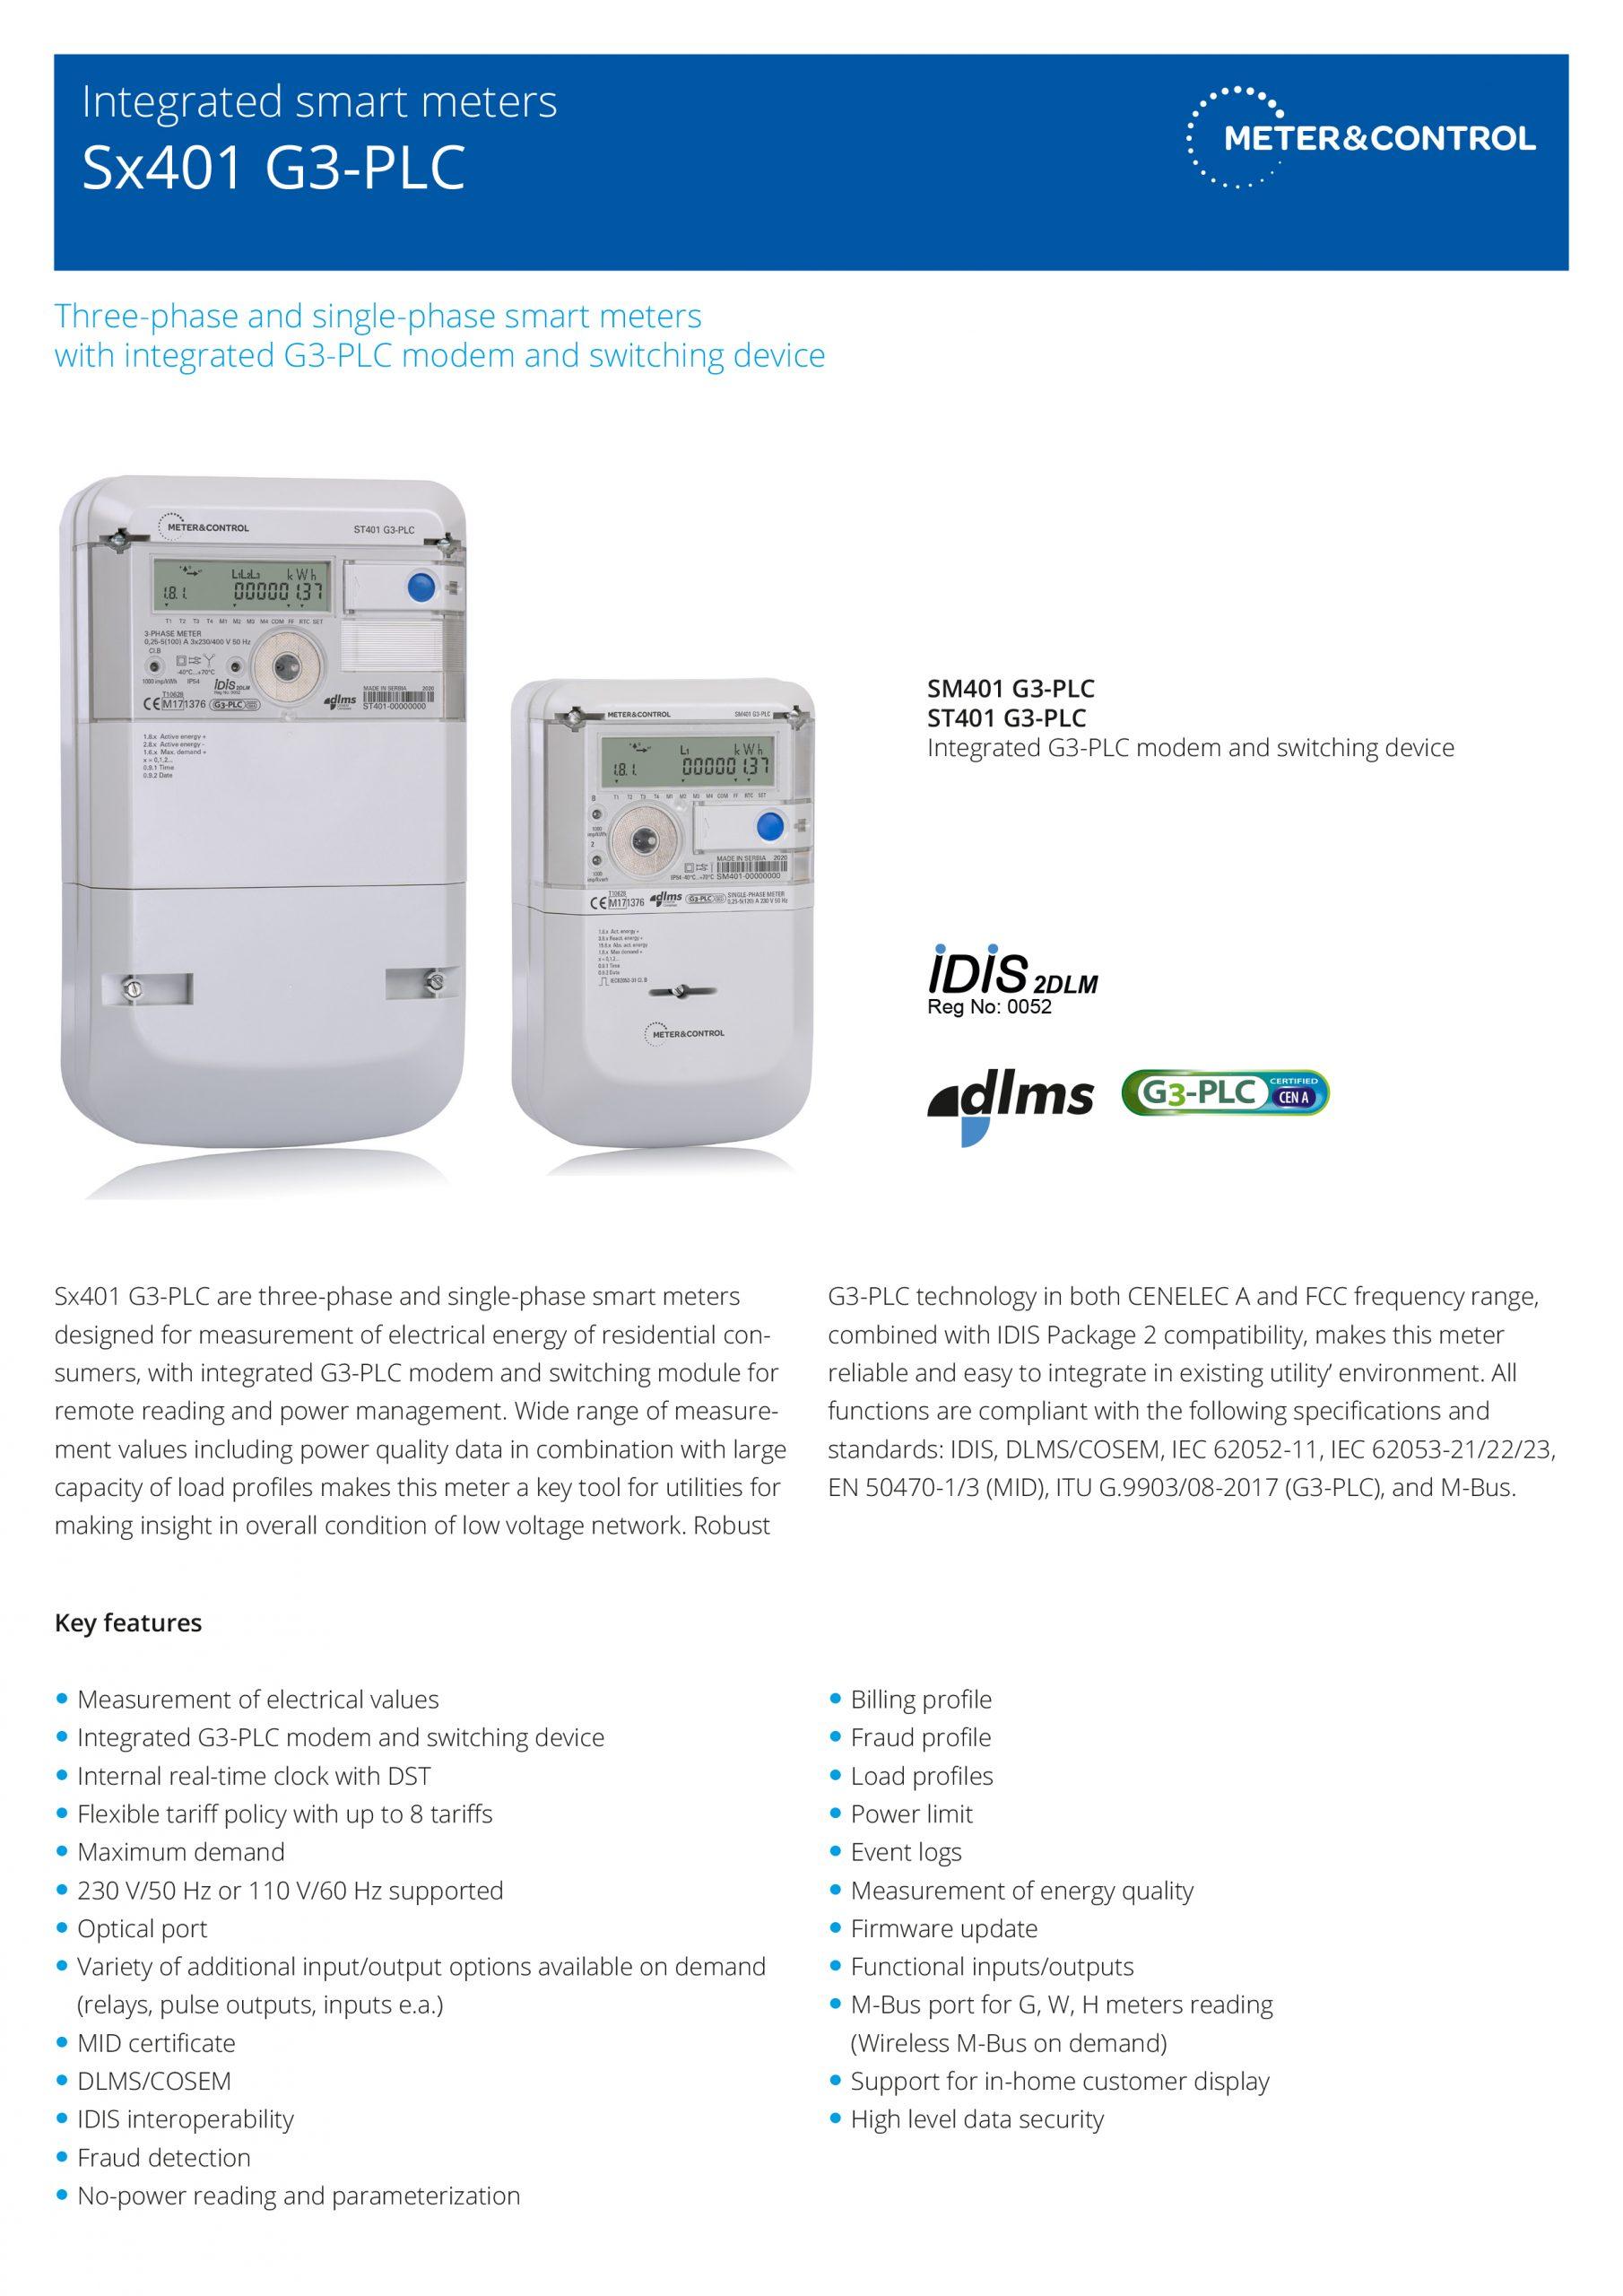 Sx401 G3-PLC smart meters